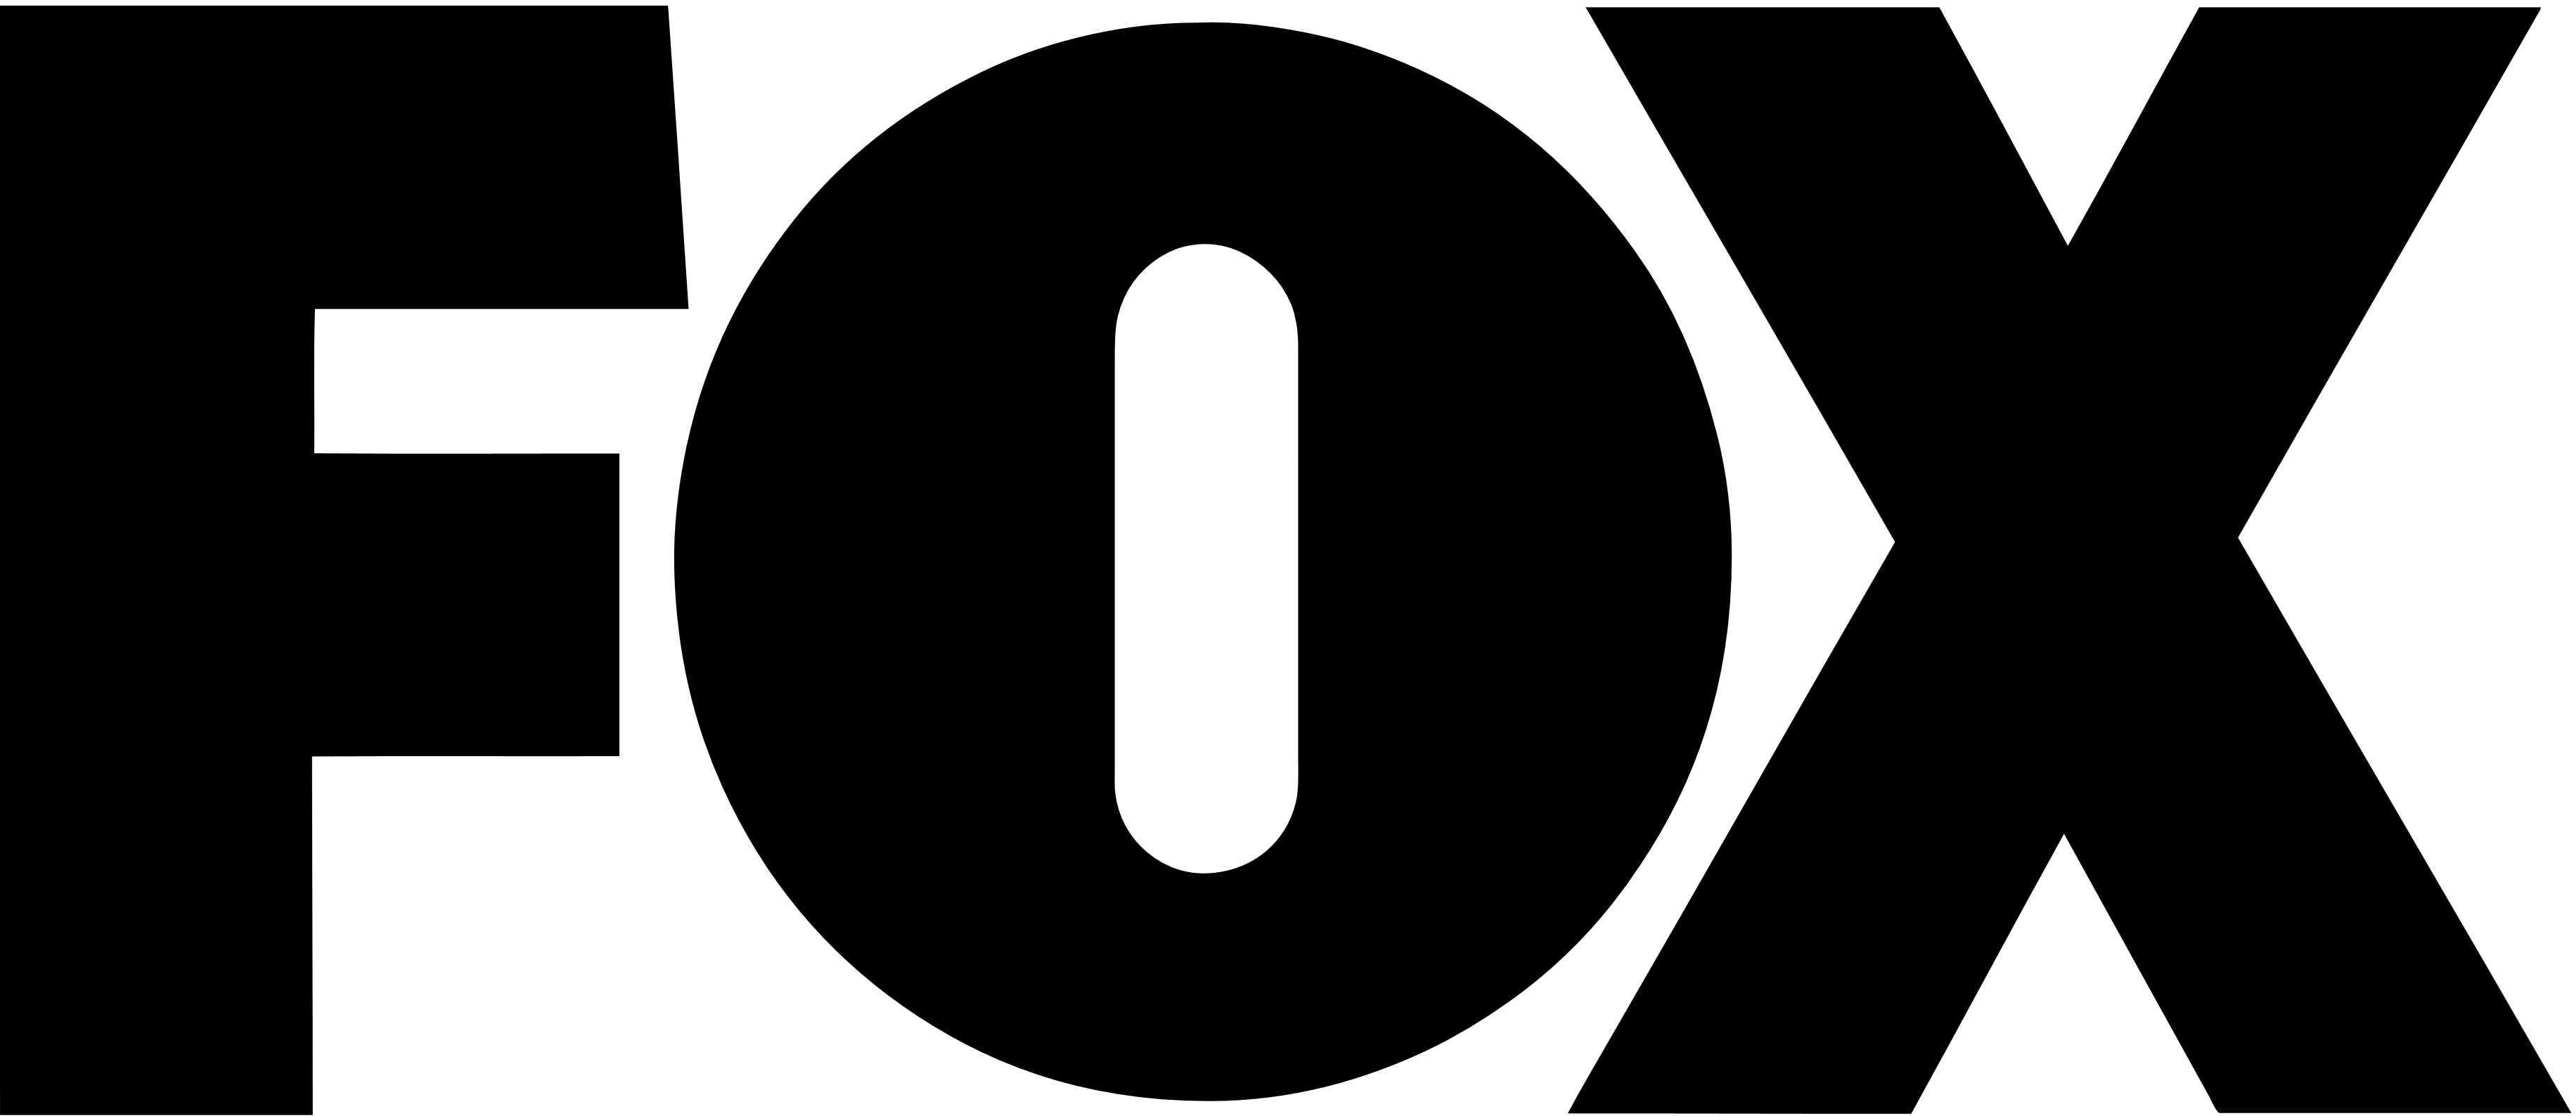 fox logo png symbol 4369 free transparent png logos